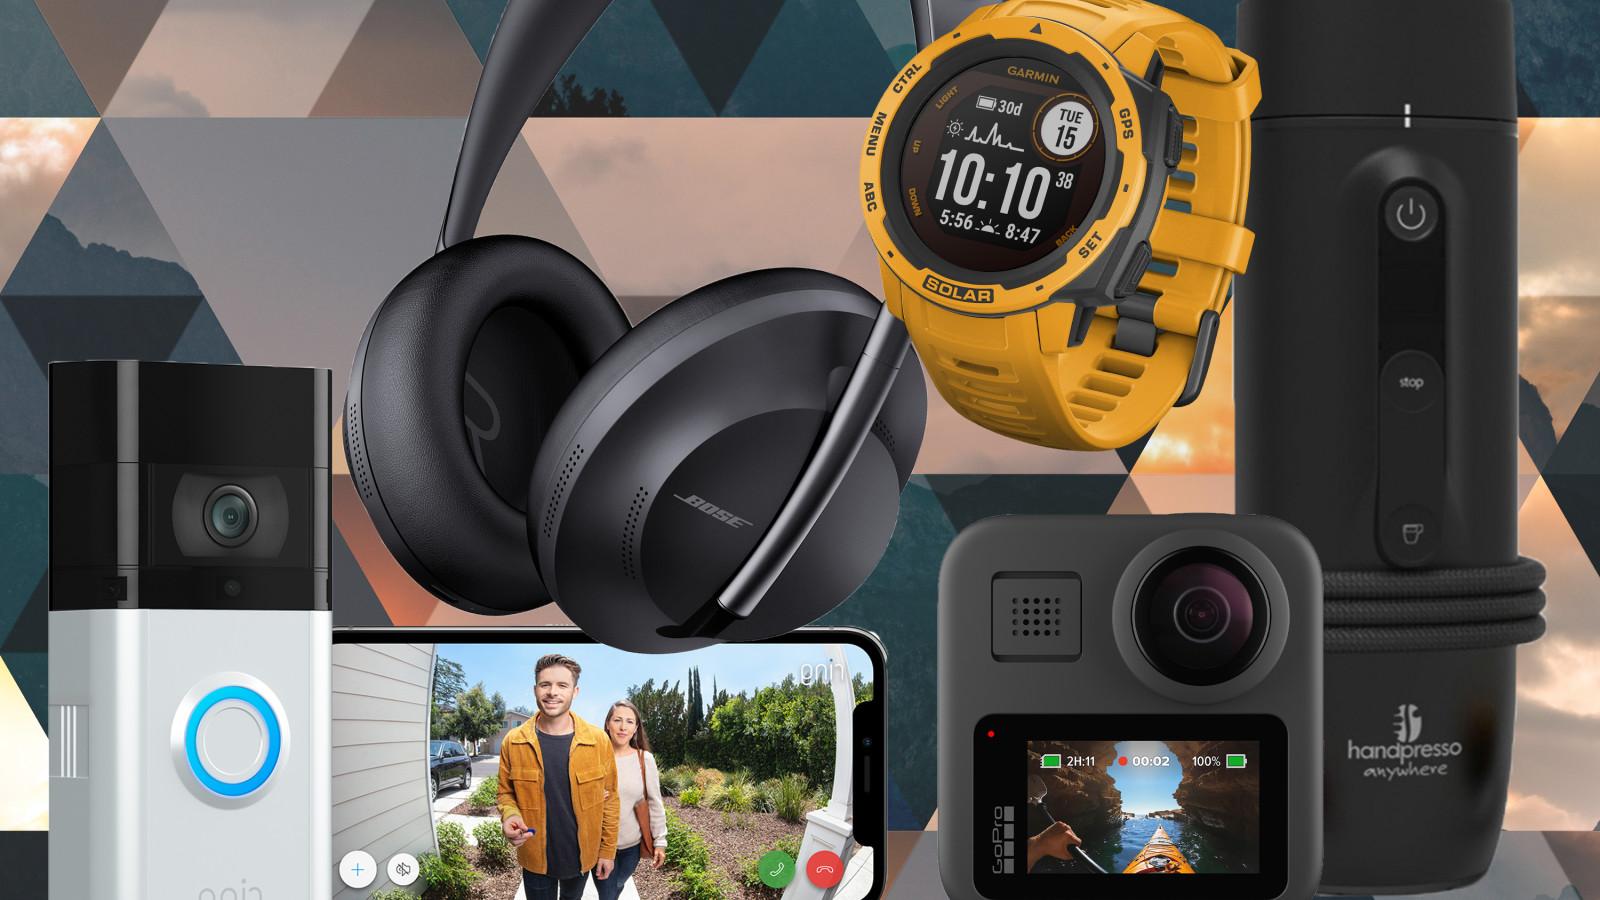 Outdoor-Gadgets, Gadgets, Sommer 2020, Sommerurlaub